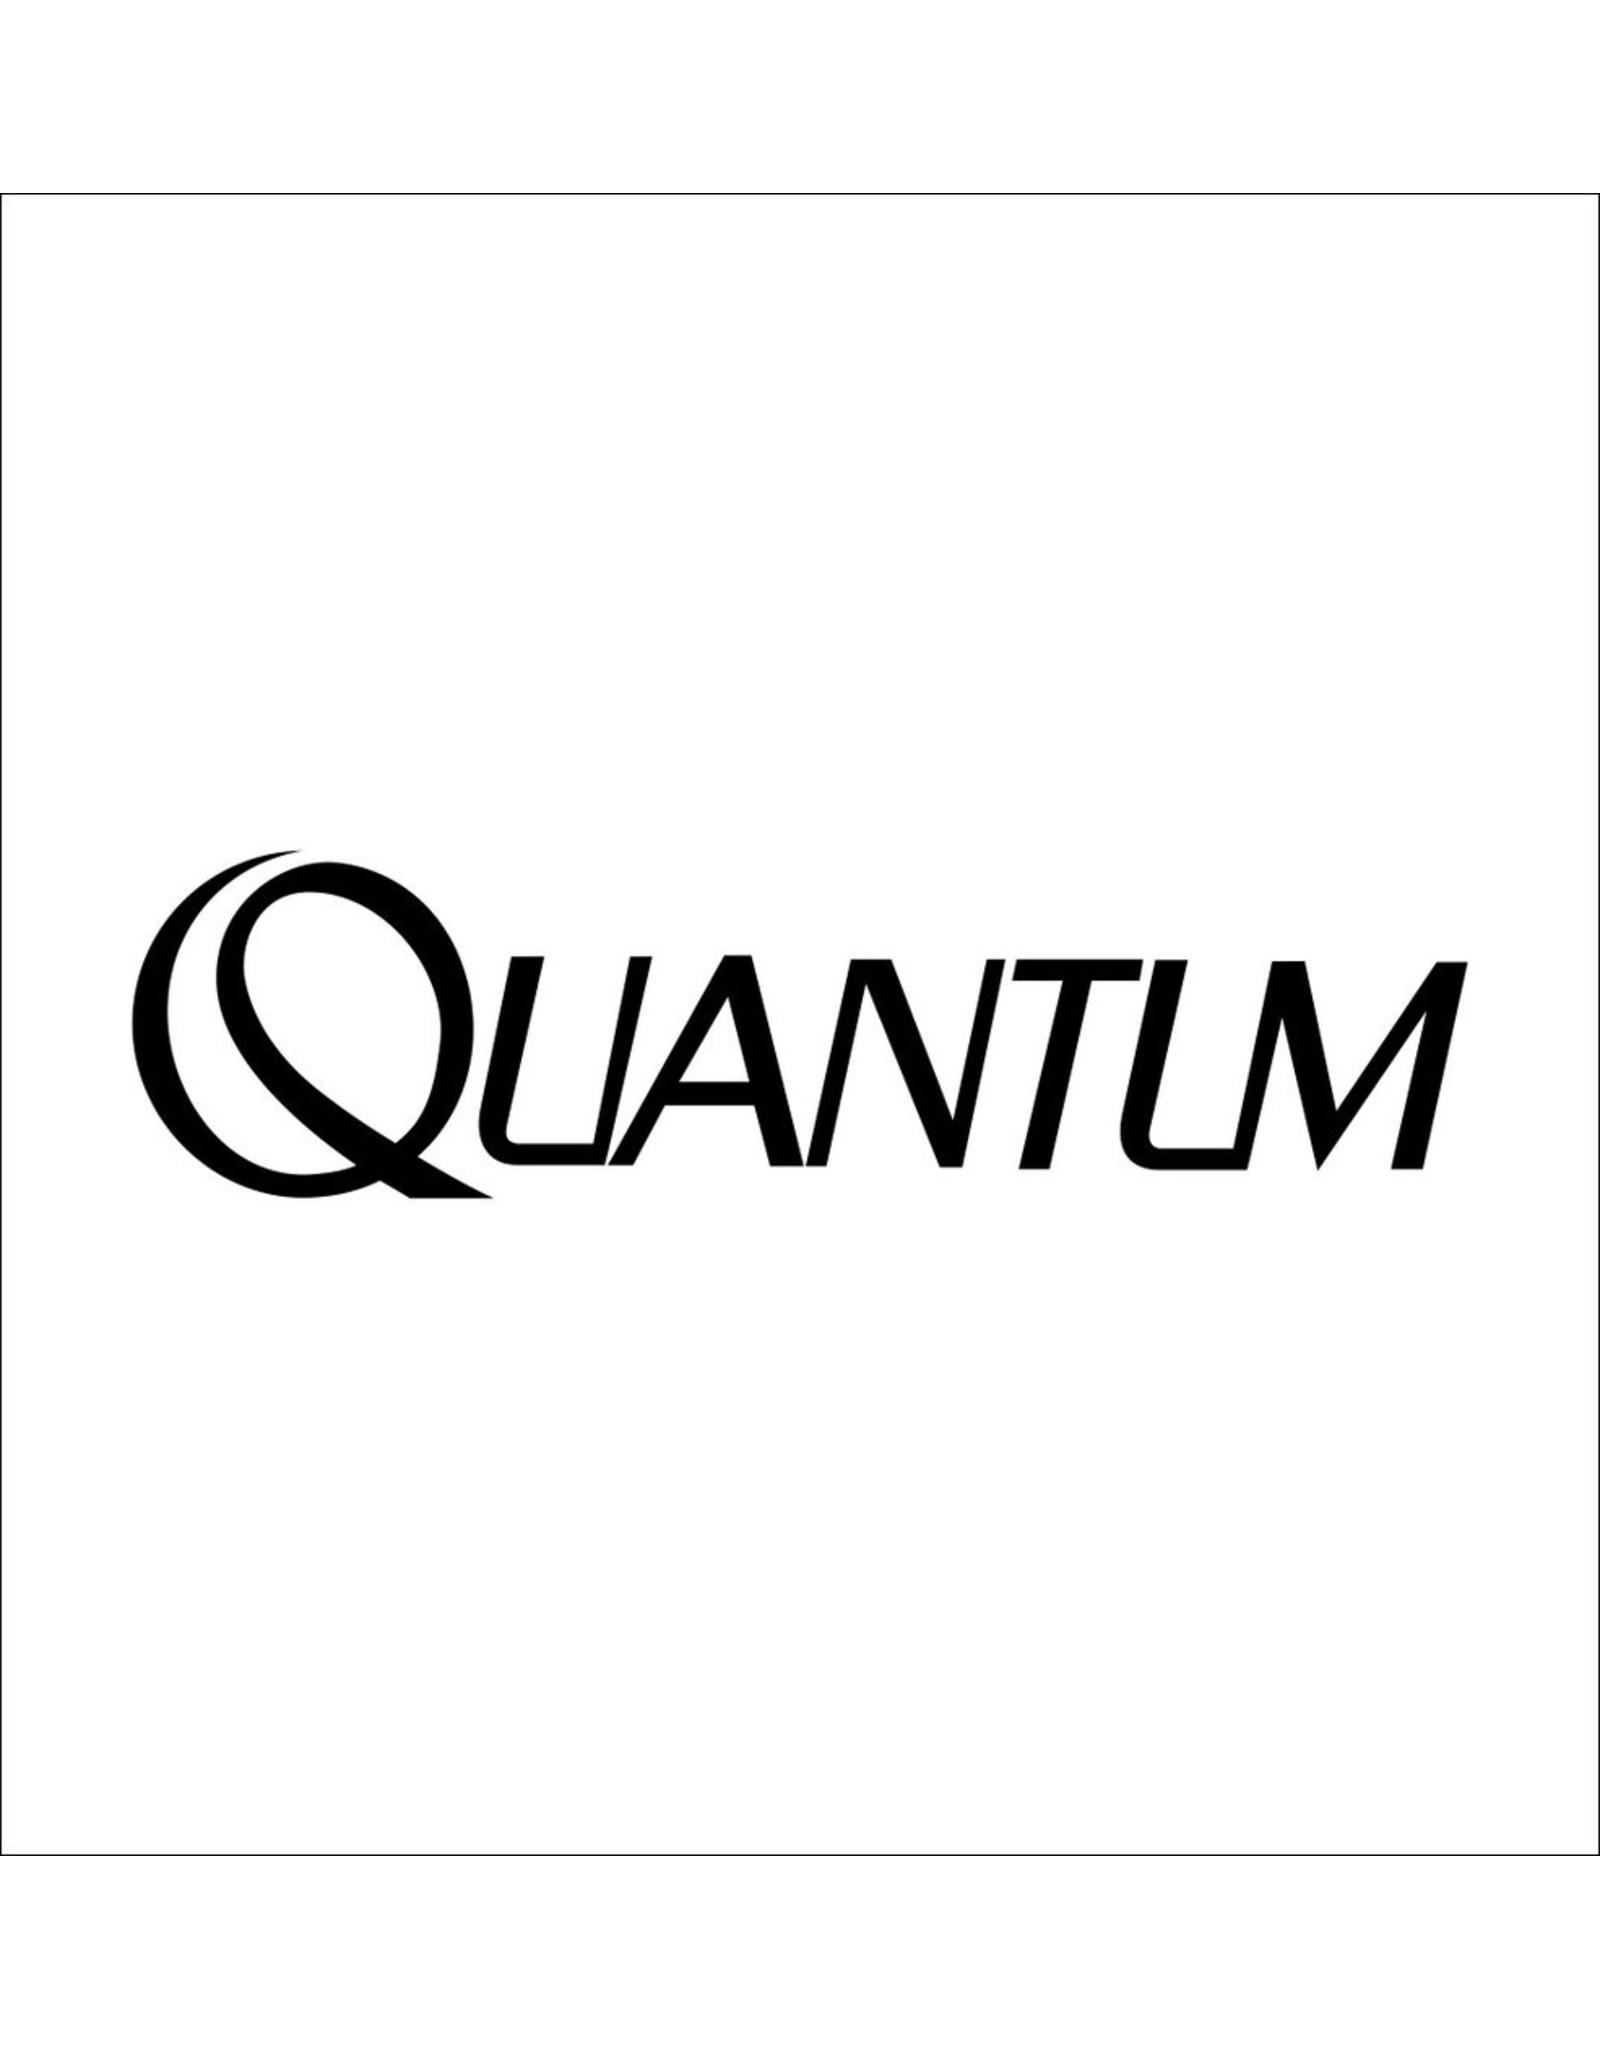 Quantum GEAR SIDE COVER ASSEM